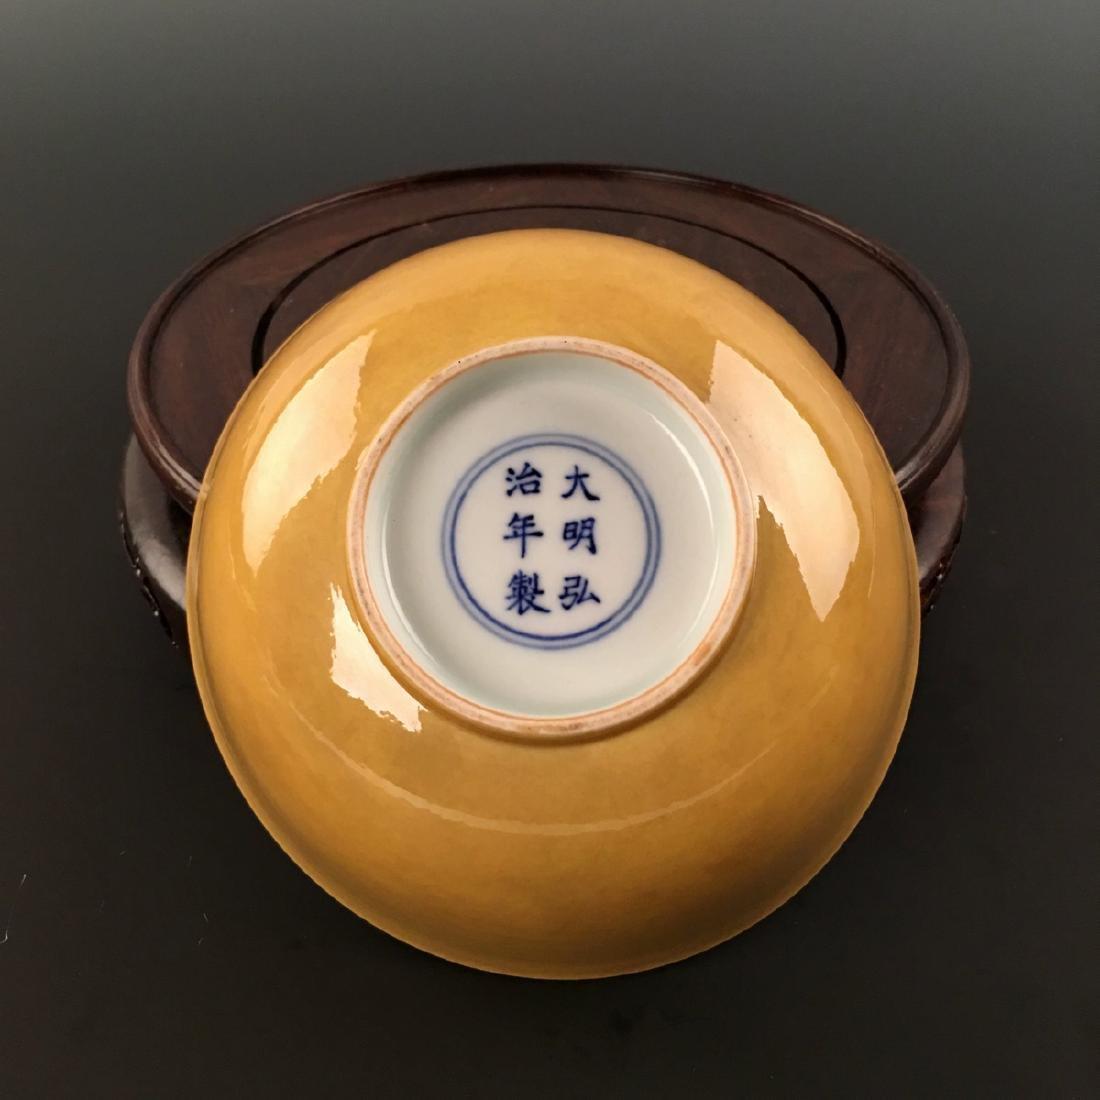 Chinese Yellow Glazed Ceramic Bowl With Hongzhi's Mark - 5